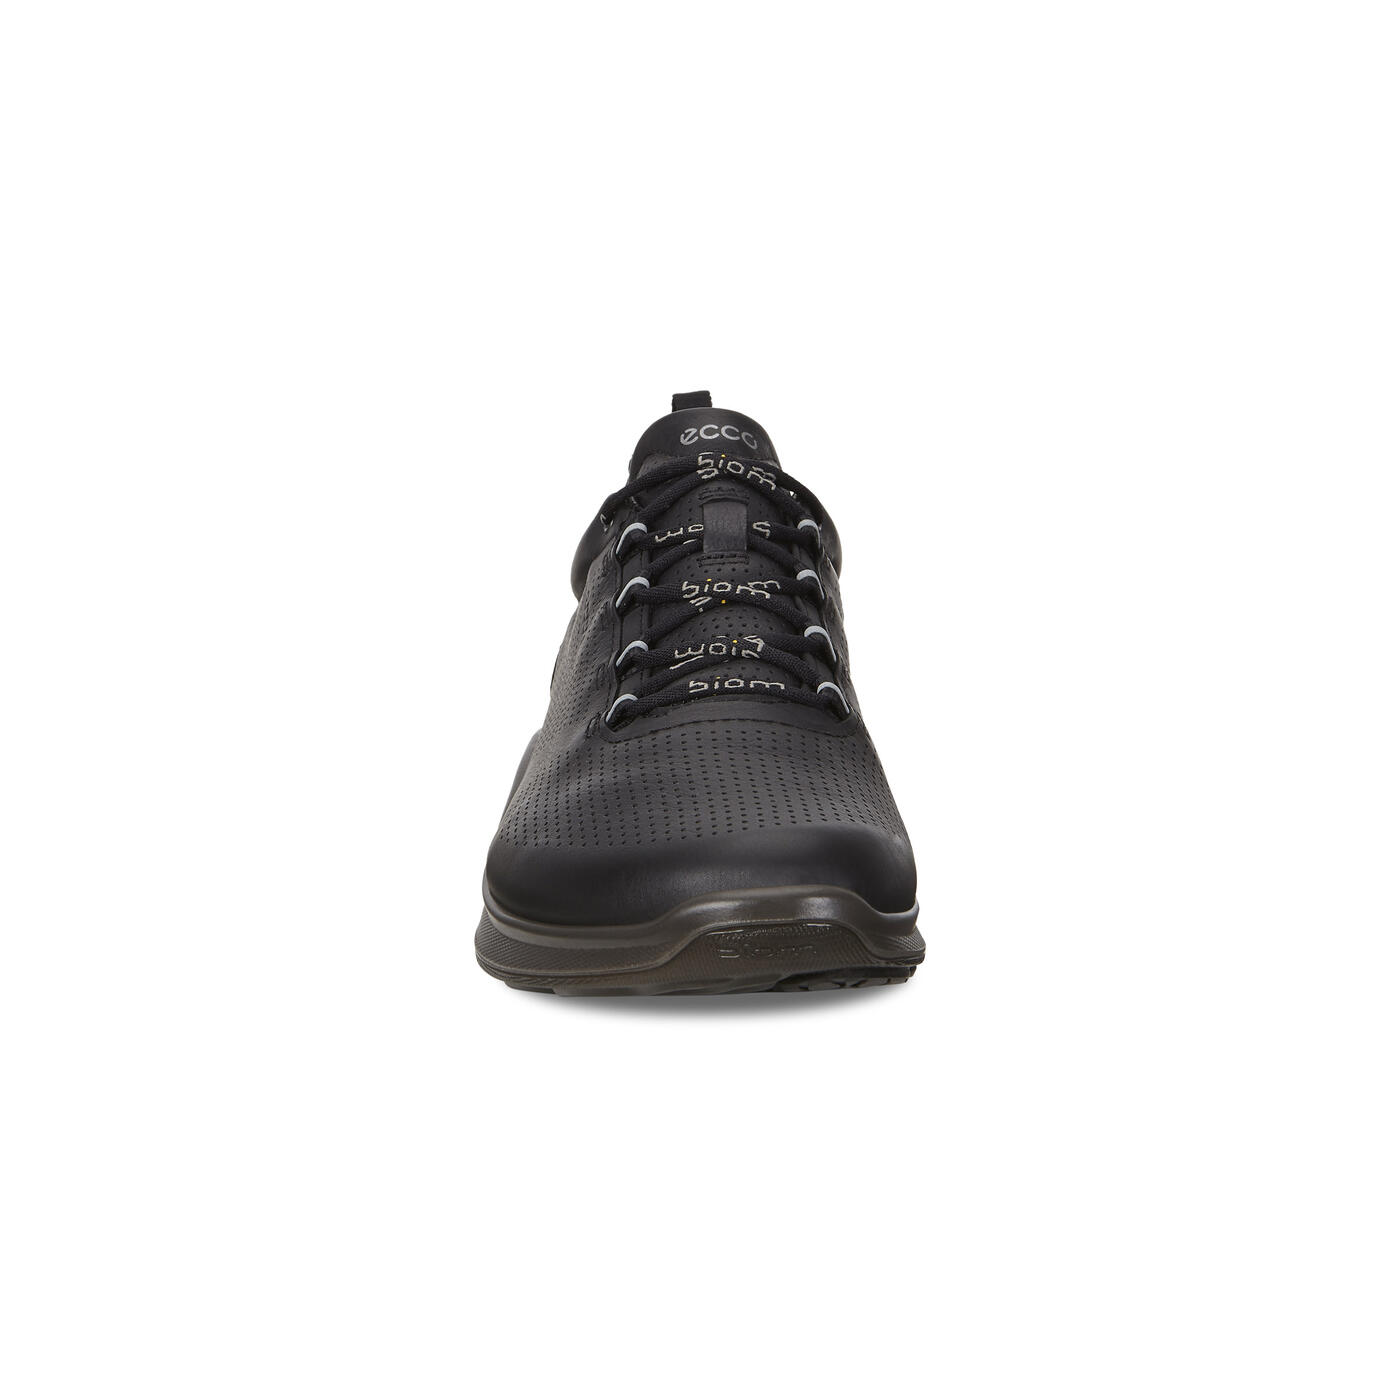 ECCO Biom Fjuel Women's Shoes